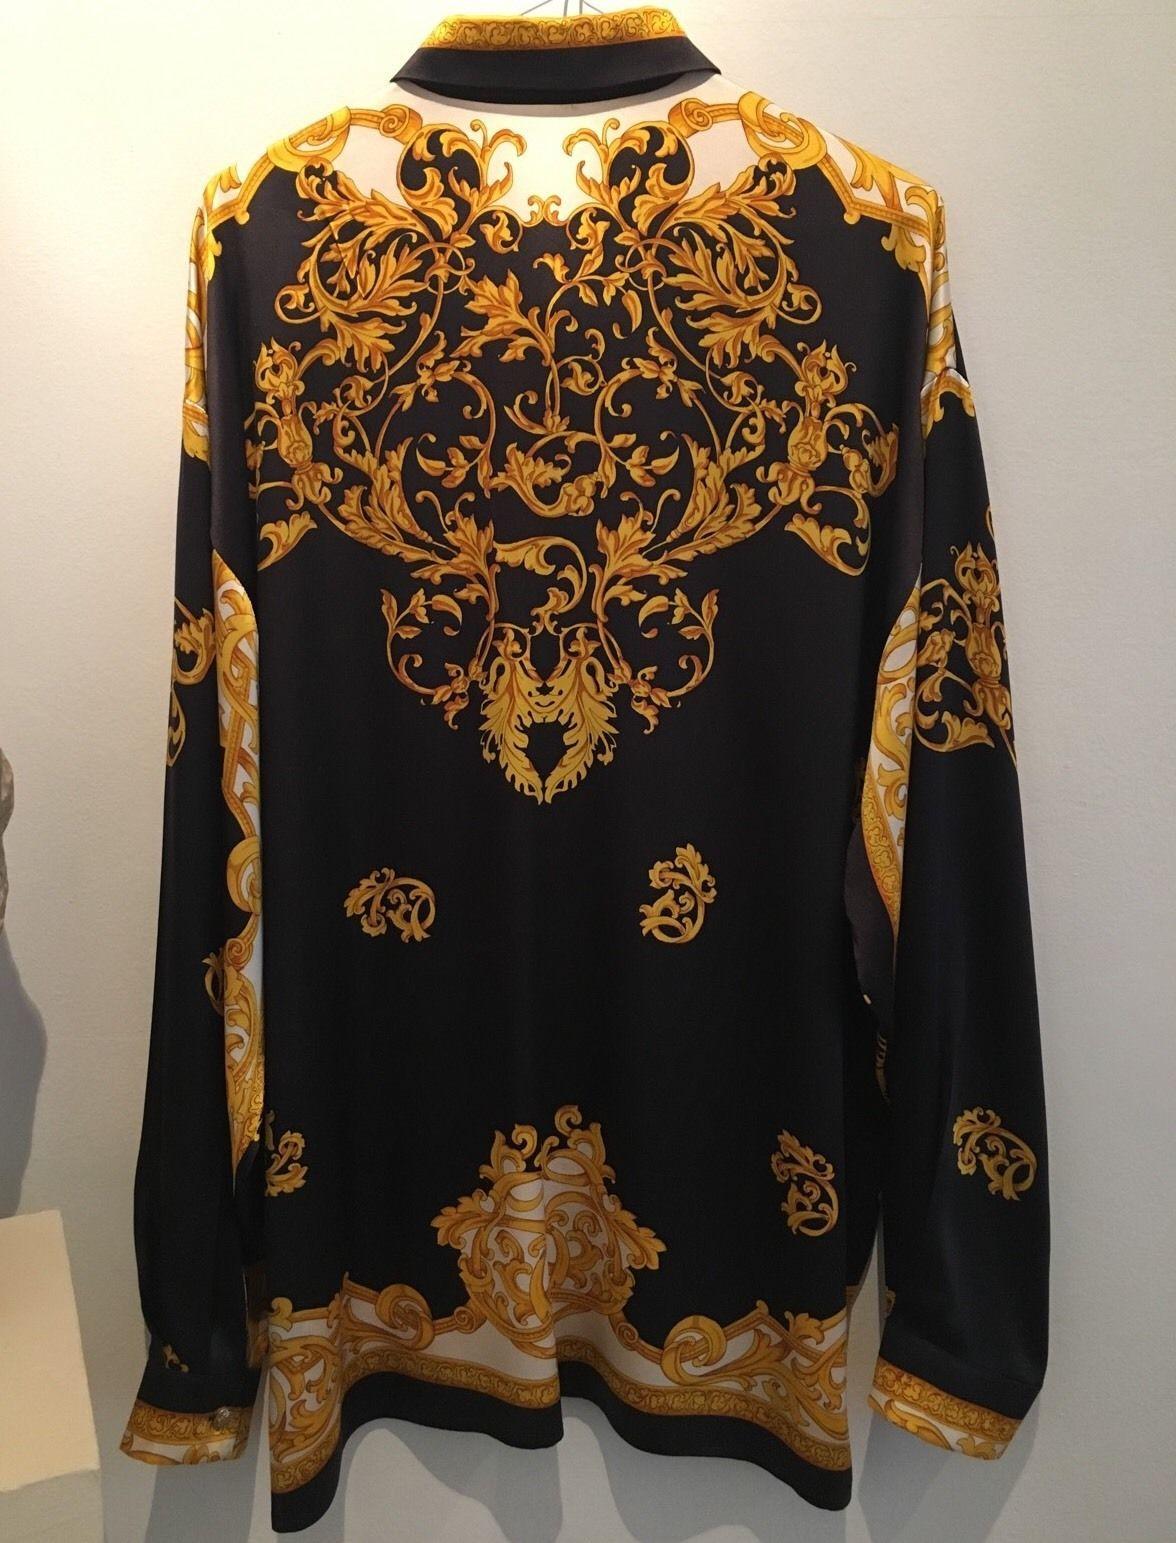 953db3f3efcbe3 RARE Gianni Versace Vintage Silk Shirt Size Large Excellent Condition | eBay